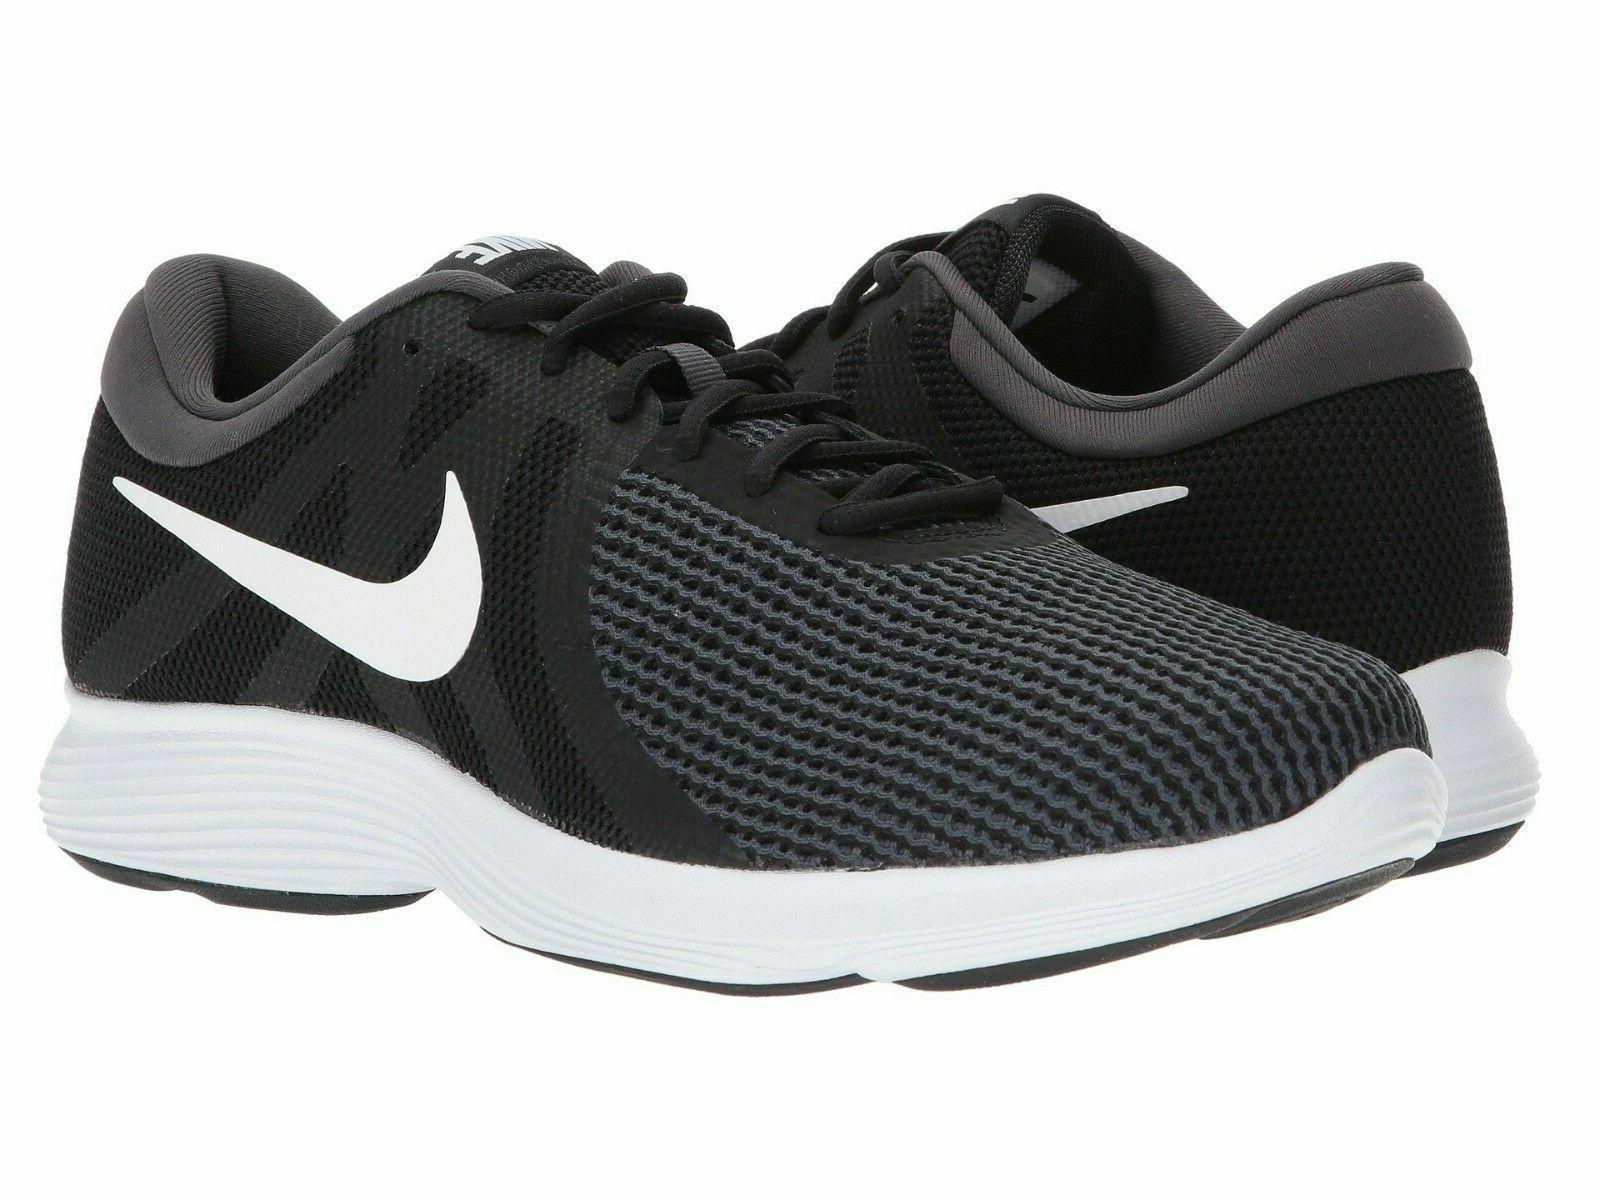 revolution 4 running shoes black white anthracite